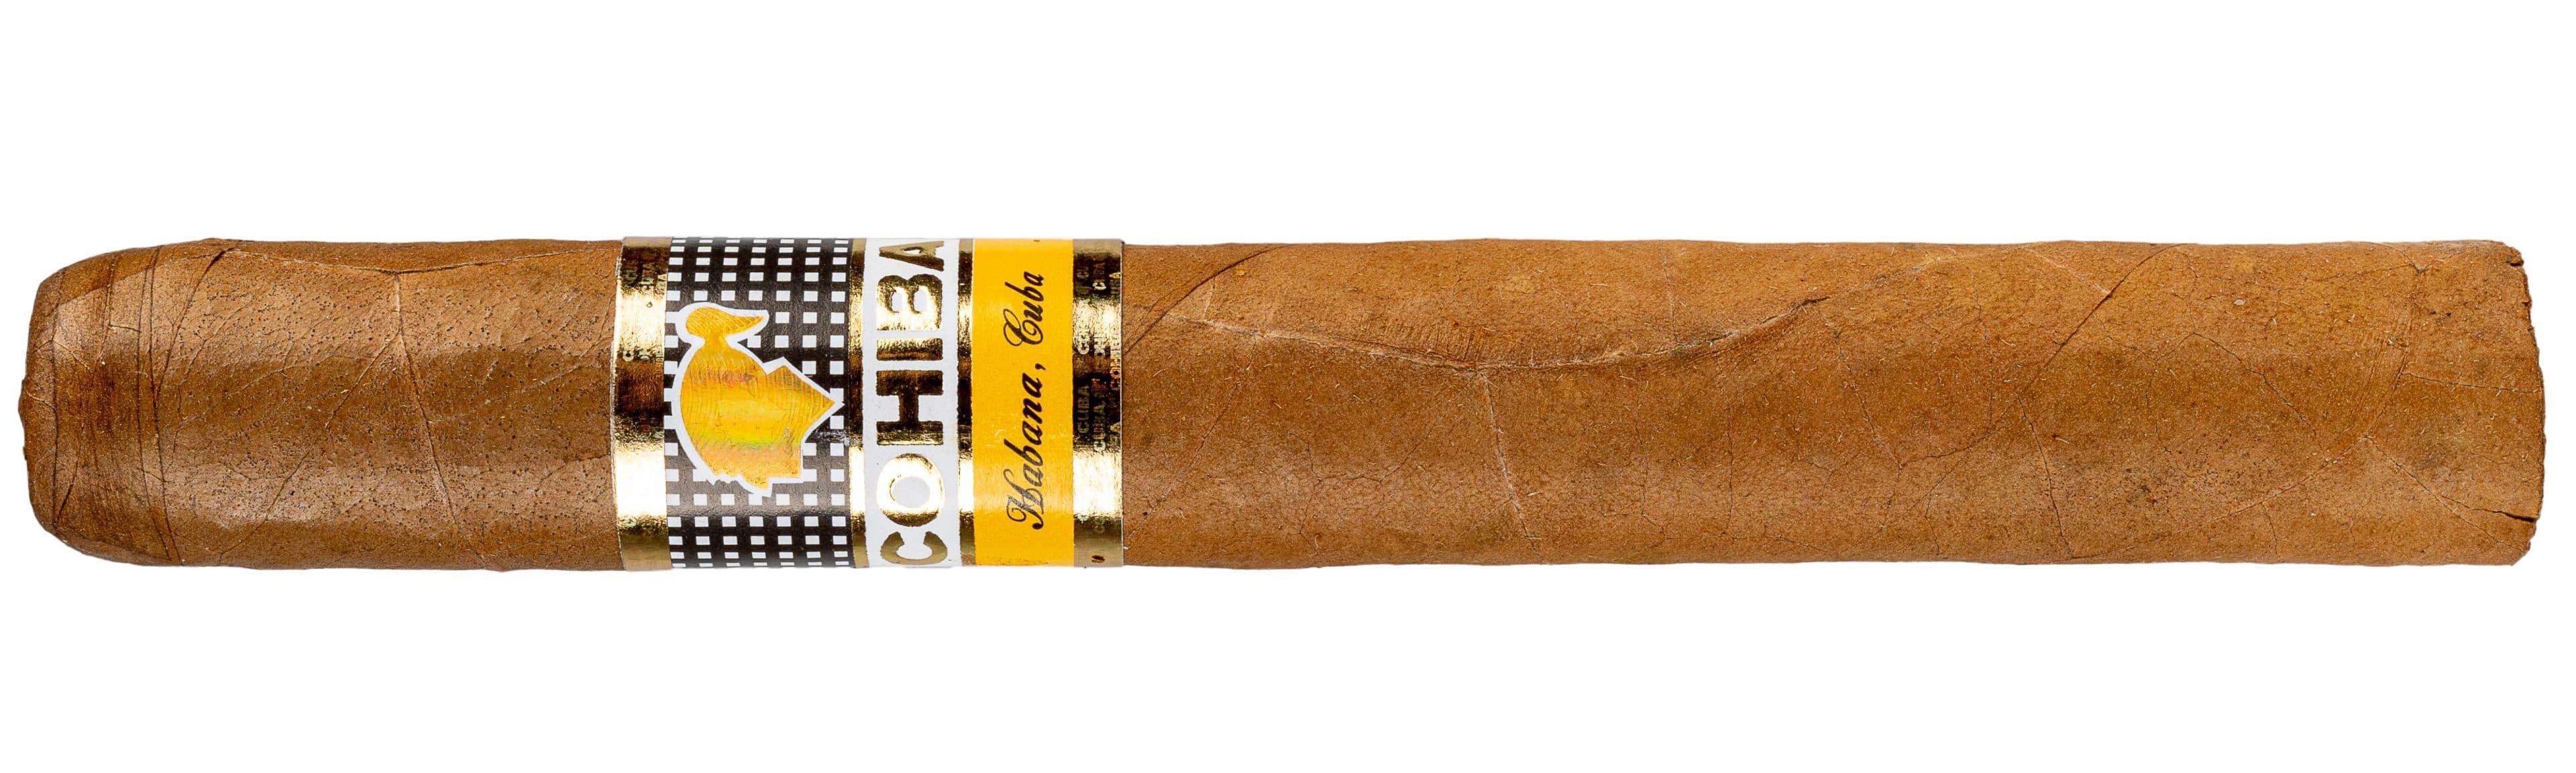 Blind Cigar Review: Cohiba   Siglo II